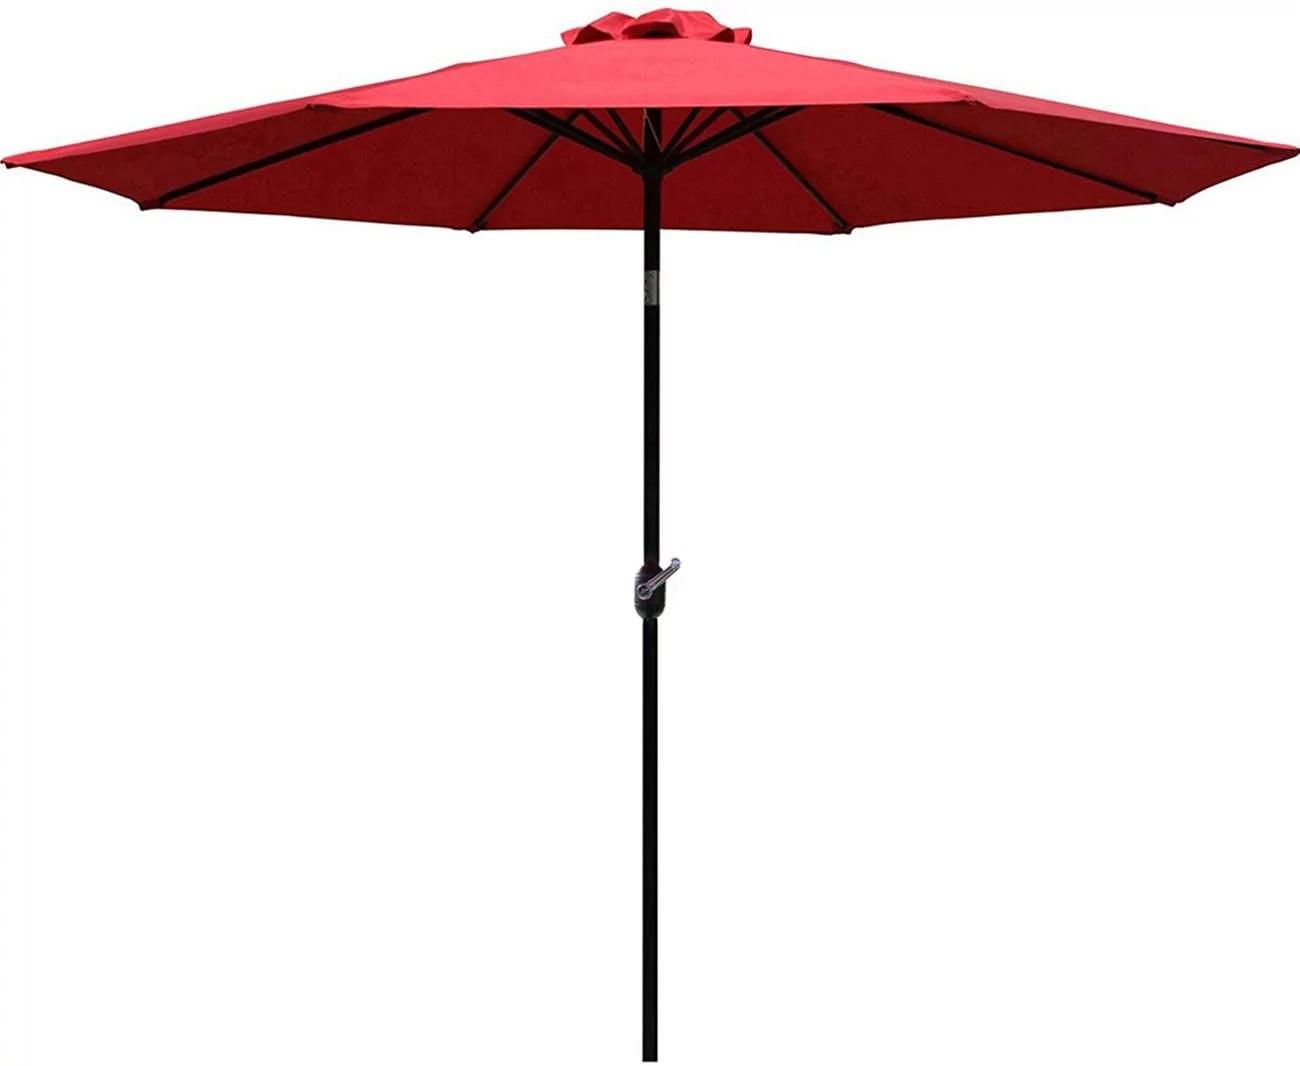 sunnyglade 9 patio umbrella outdoor table umbrella with 8 sturdy ribs red walmart com